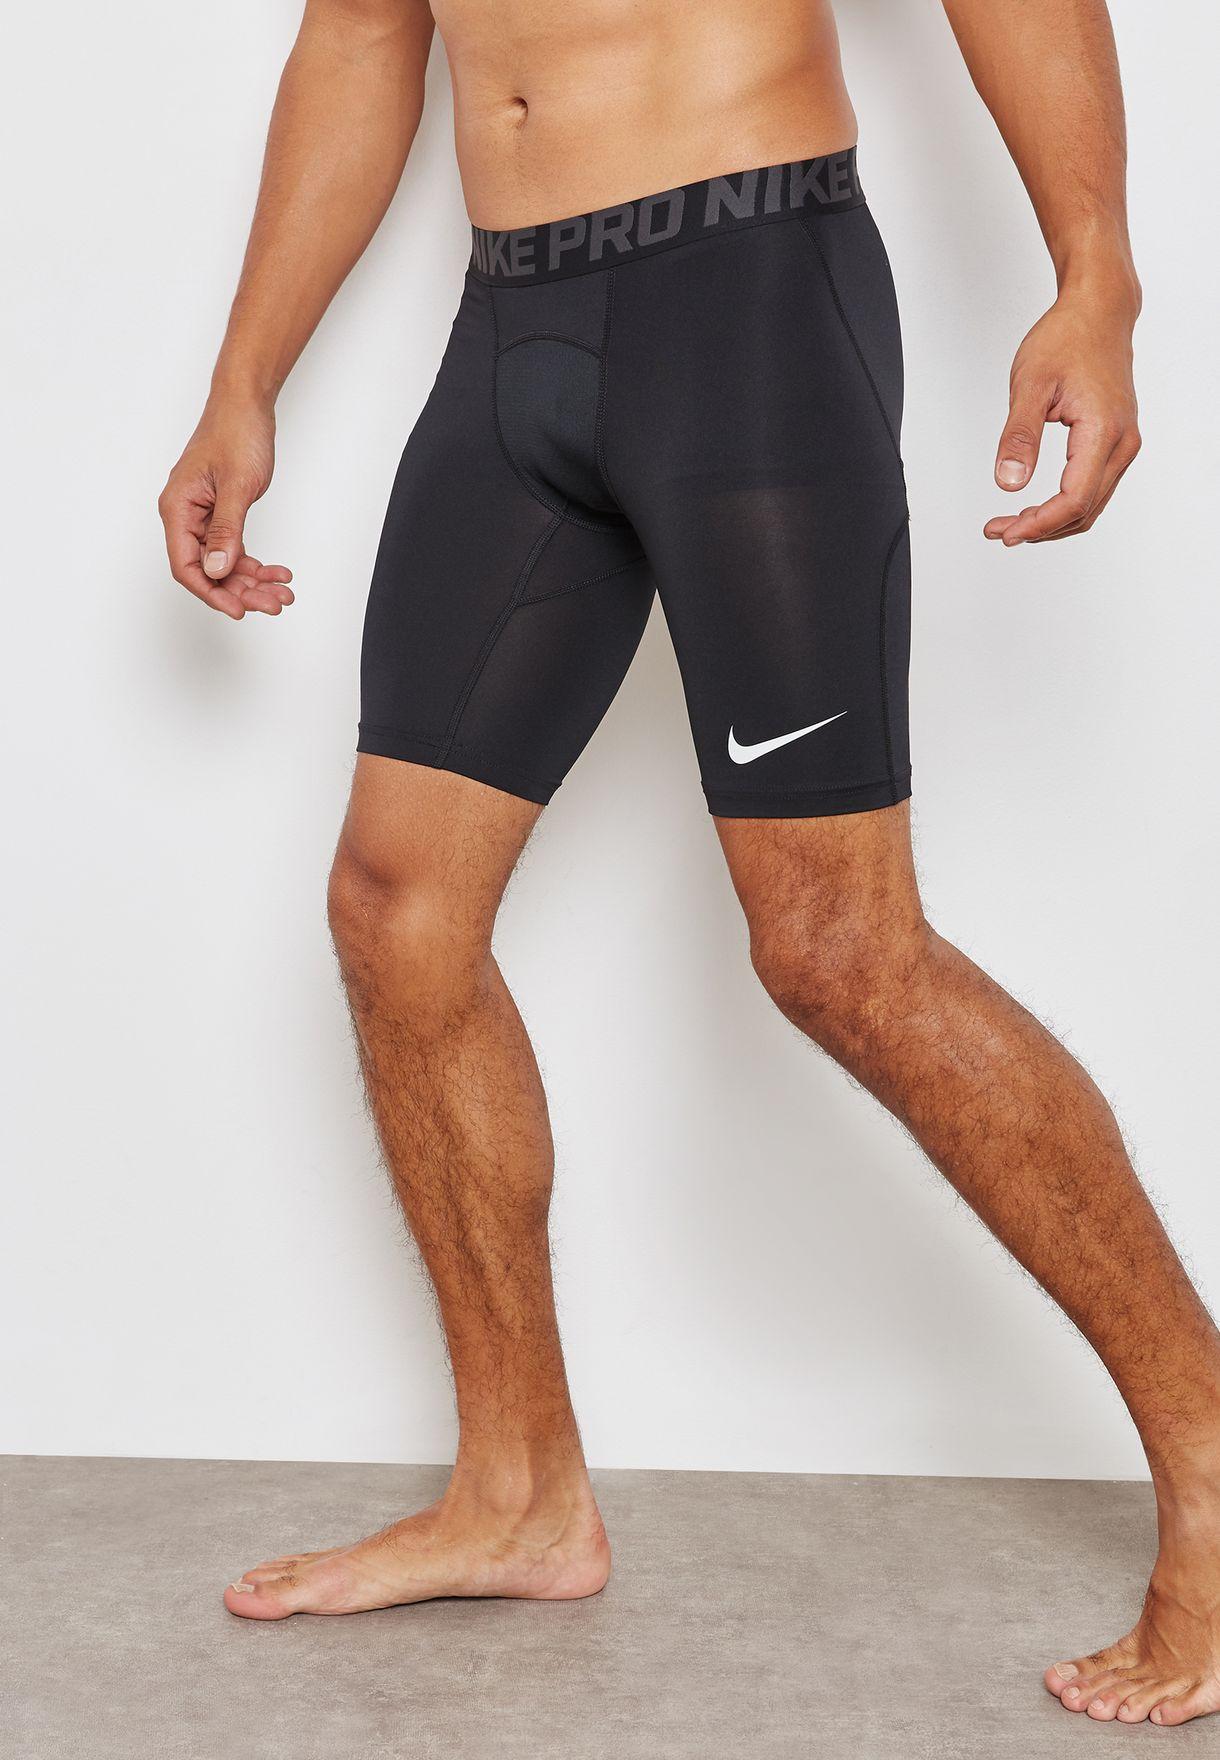 350f701610e Shop Nike black Pro Compression Shorts 838061-010 for Men in UAE ...